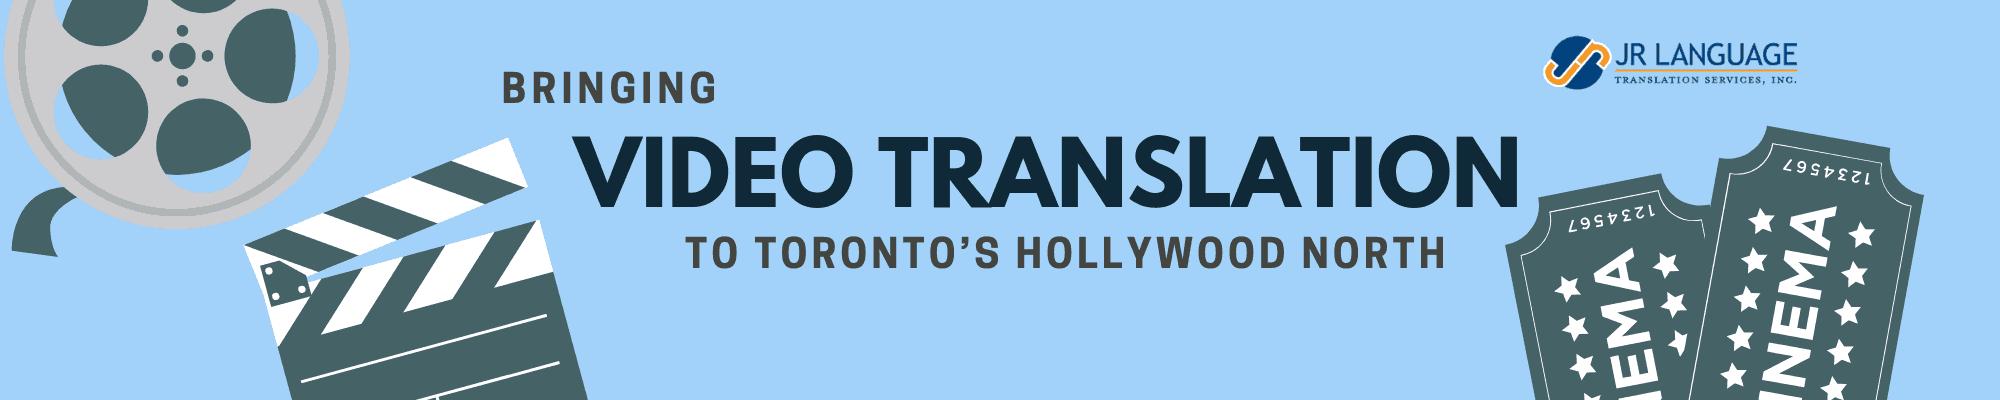 video translation services toronto global